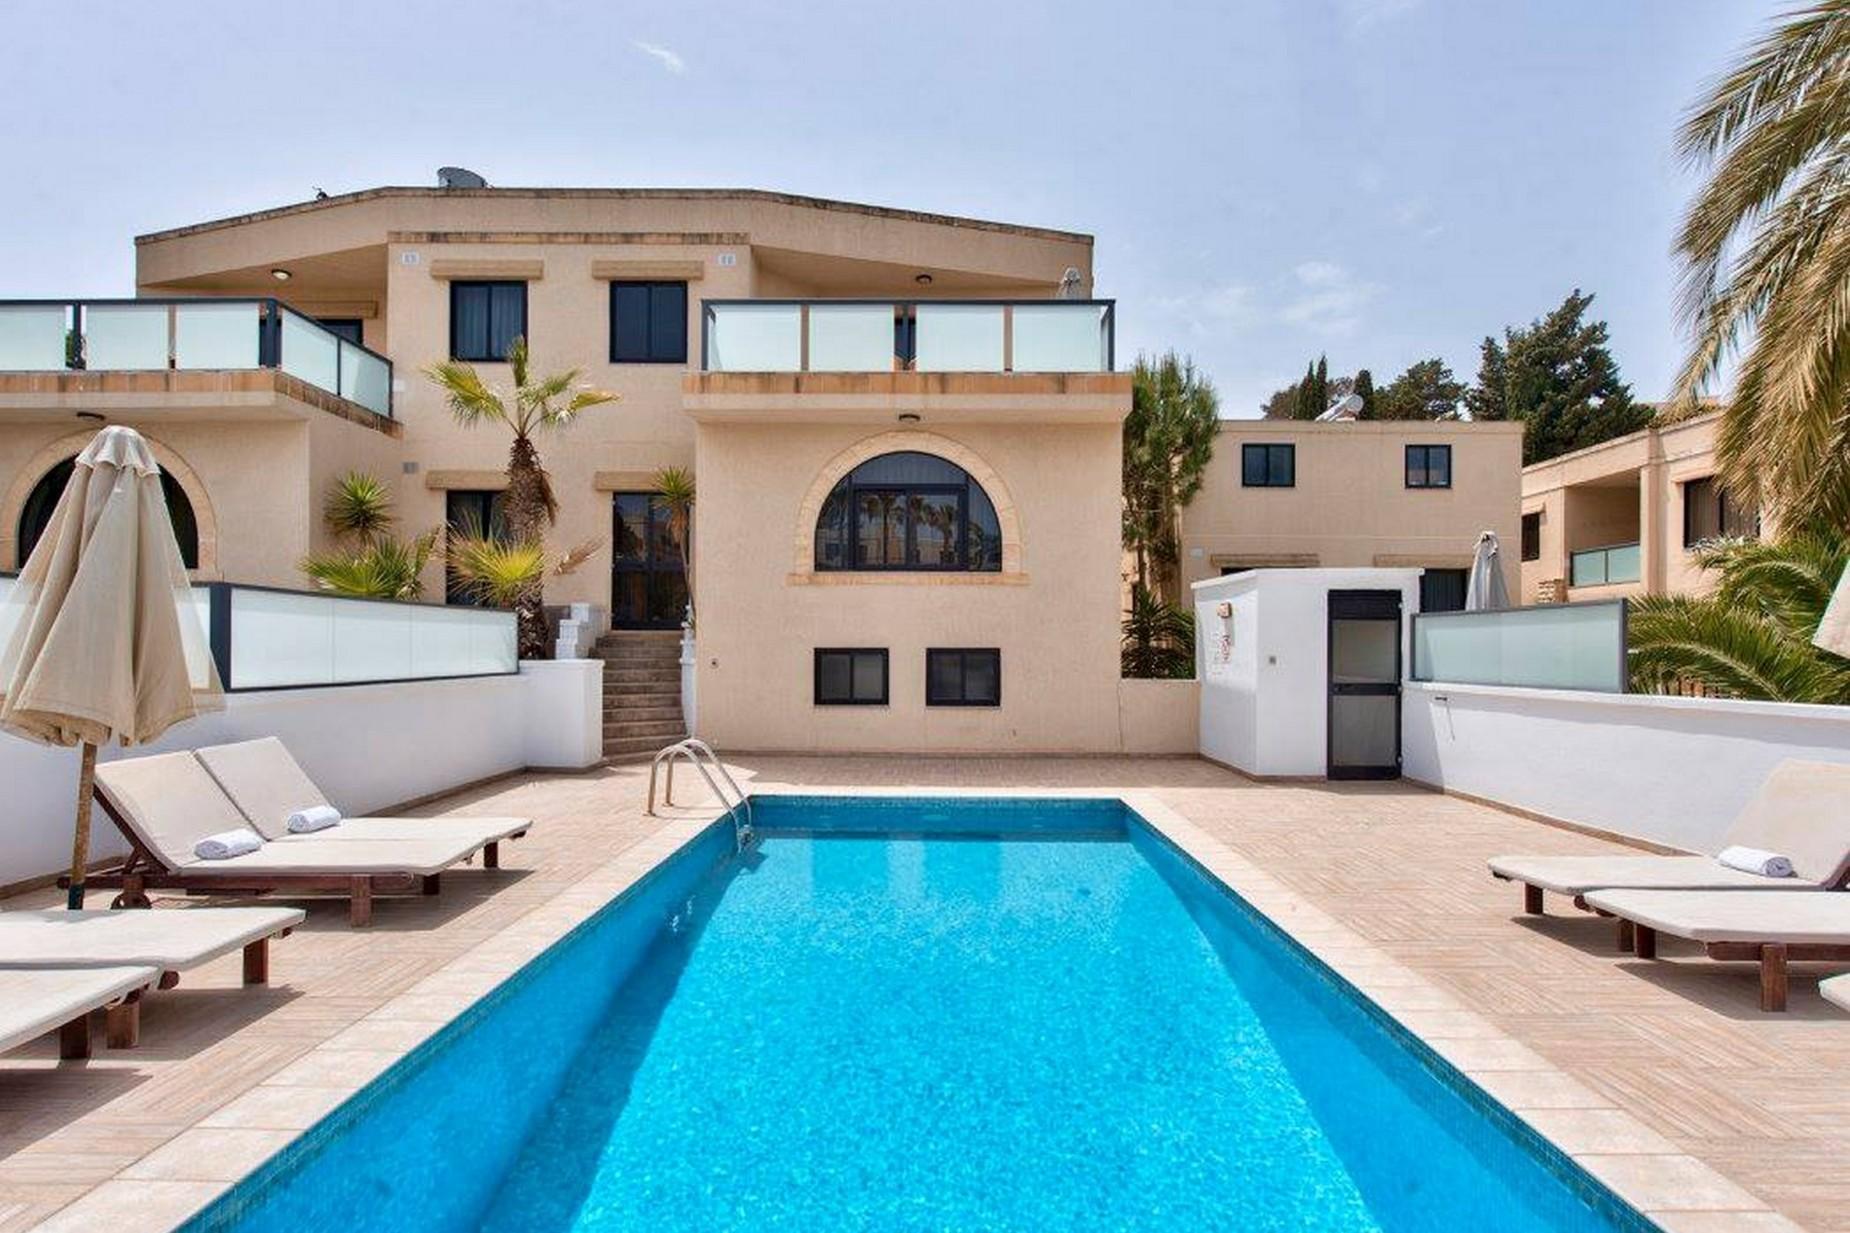 5 bed Villa For Rent in Mellieha, Mellieha - thumb 2